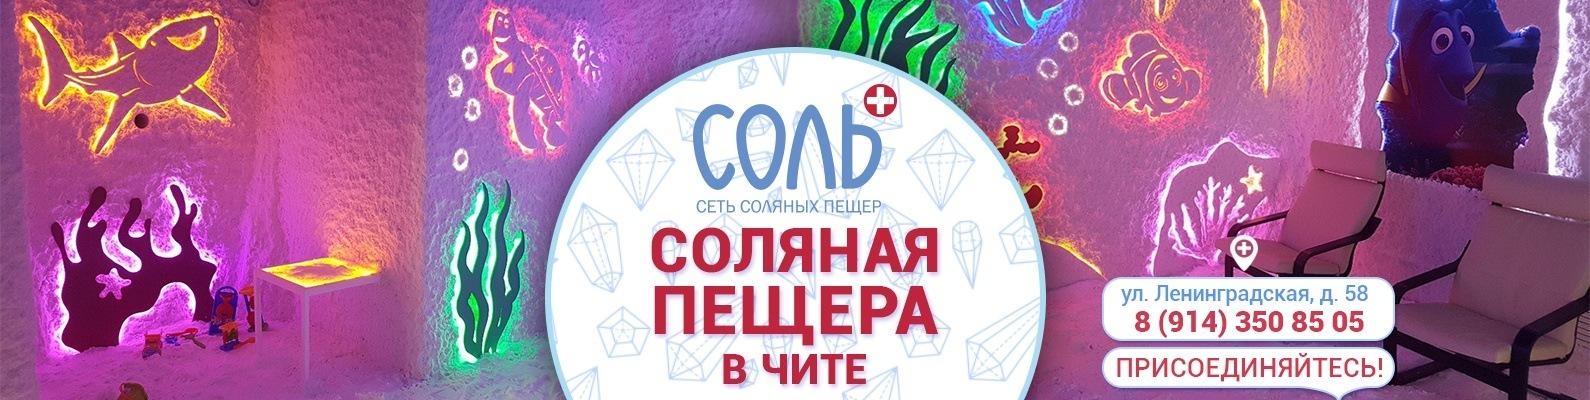 Эйфоретик online Москва